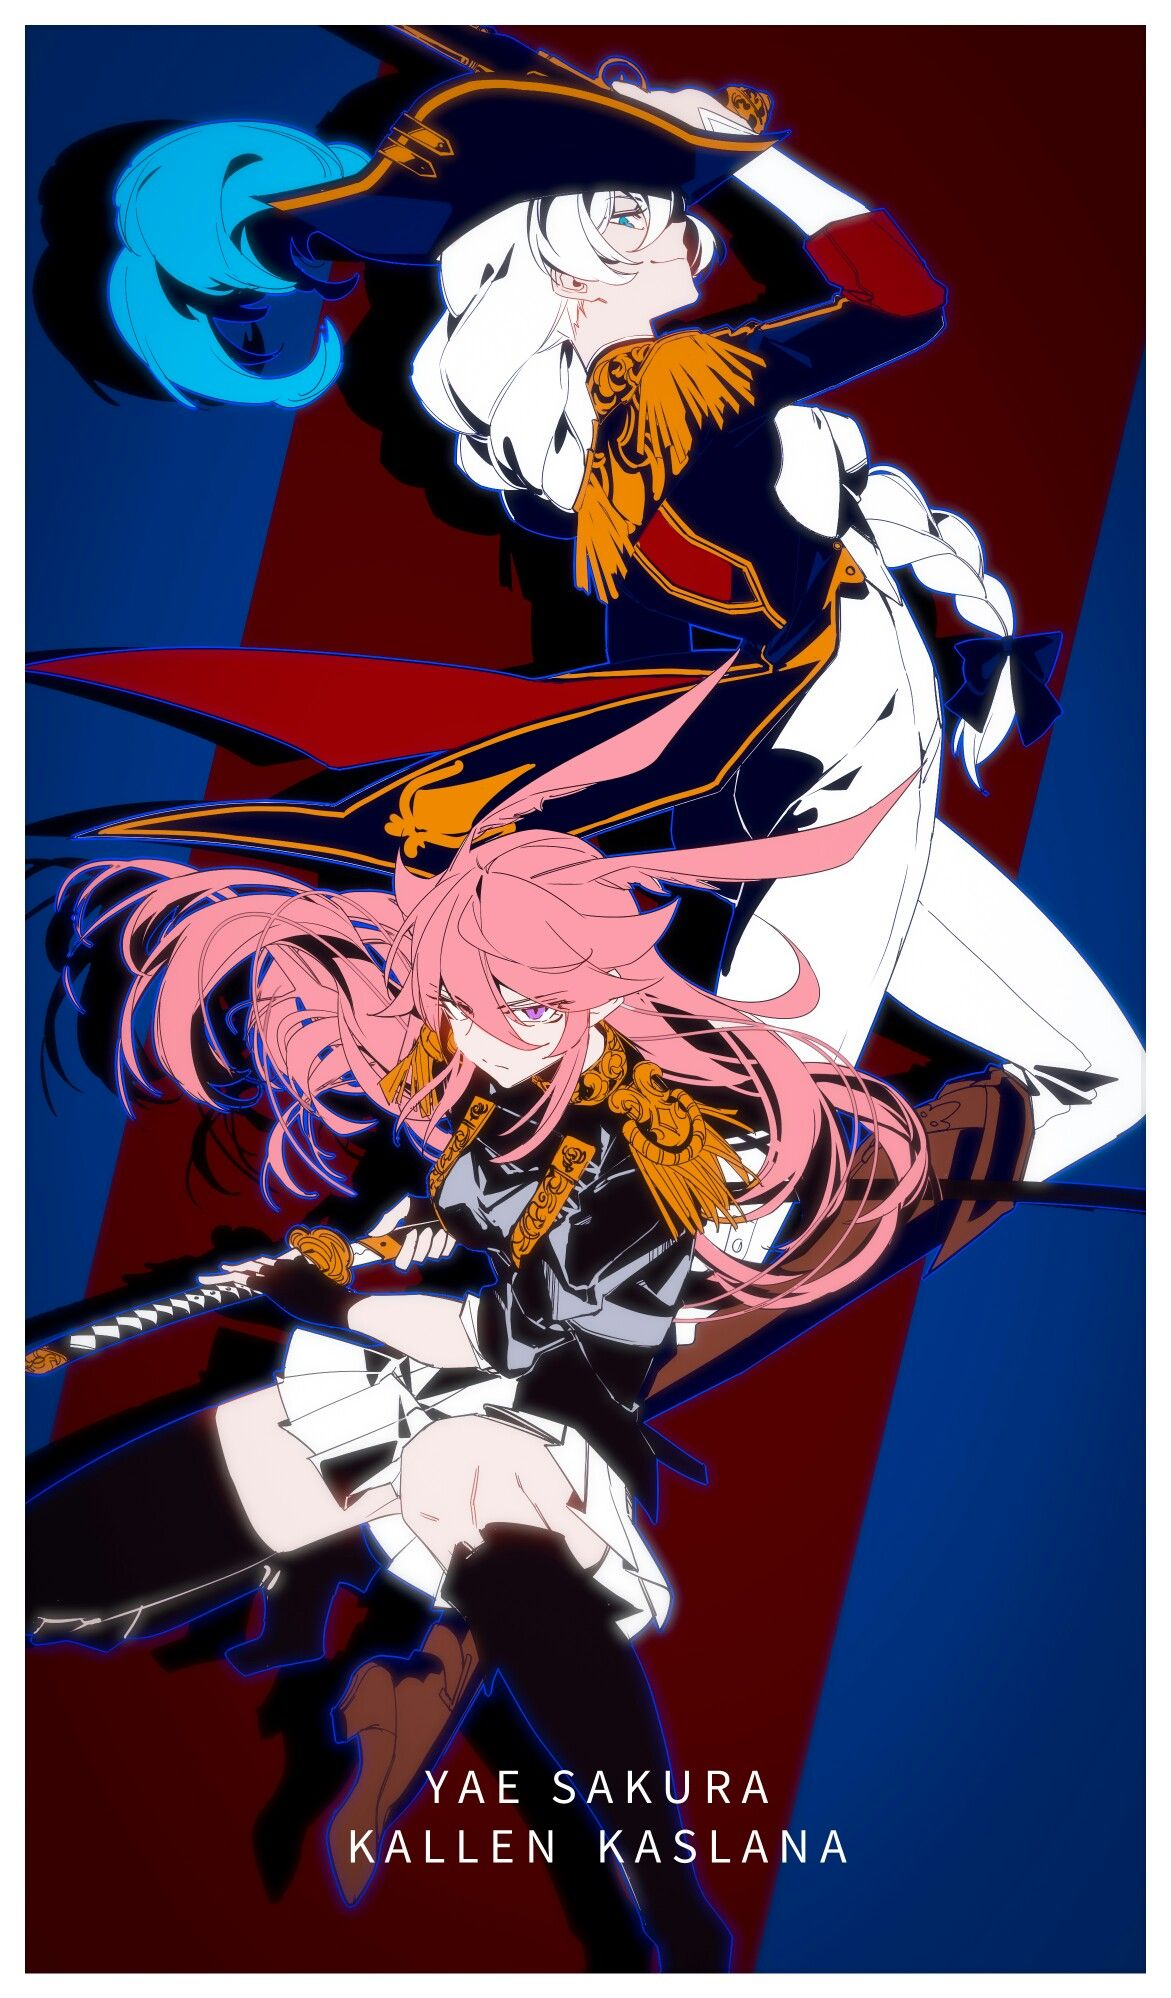 Yaezakura & Kallen Kaslana ◆ pixiv: BLAISE